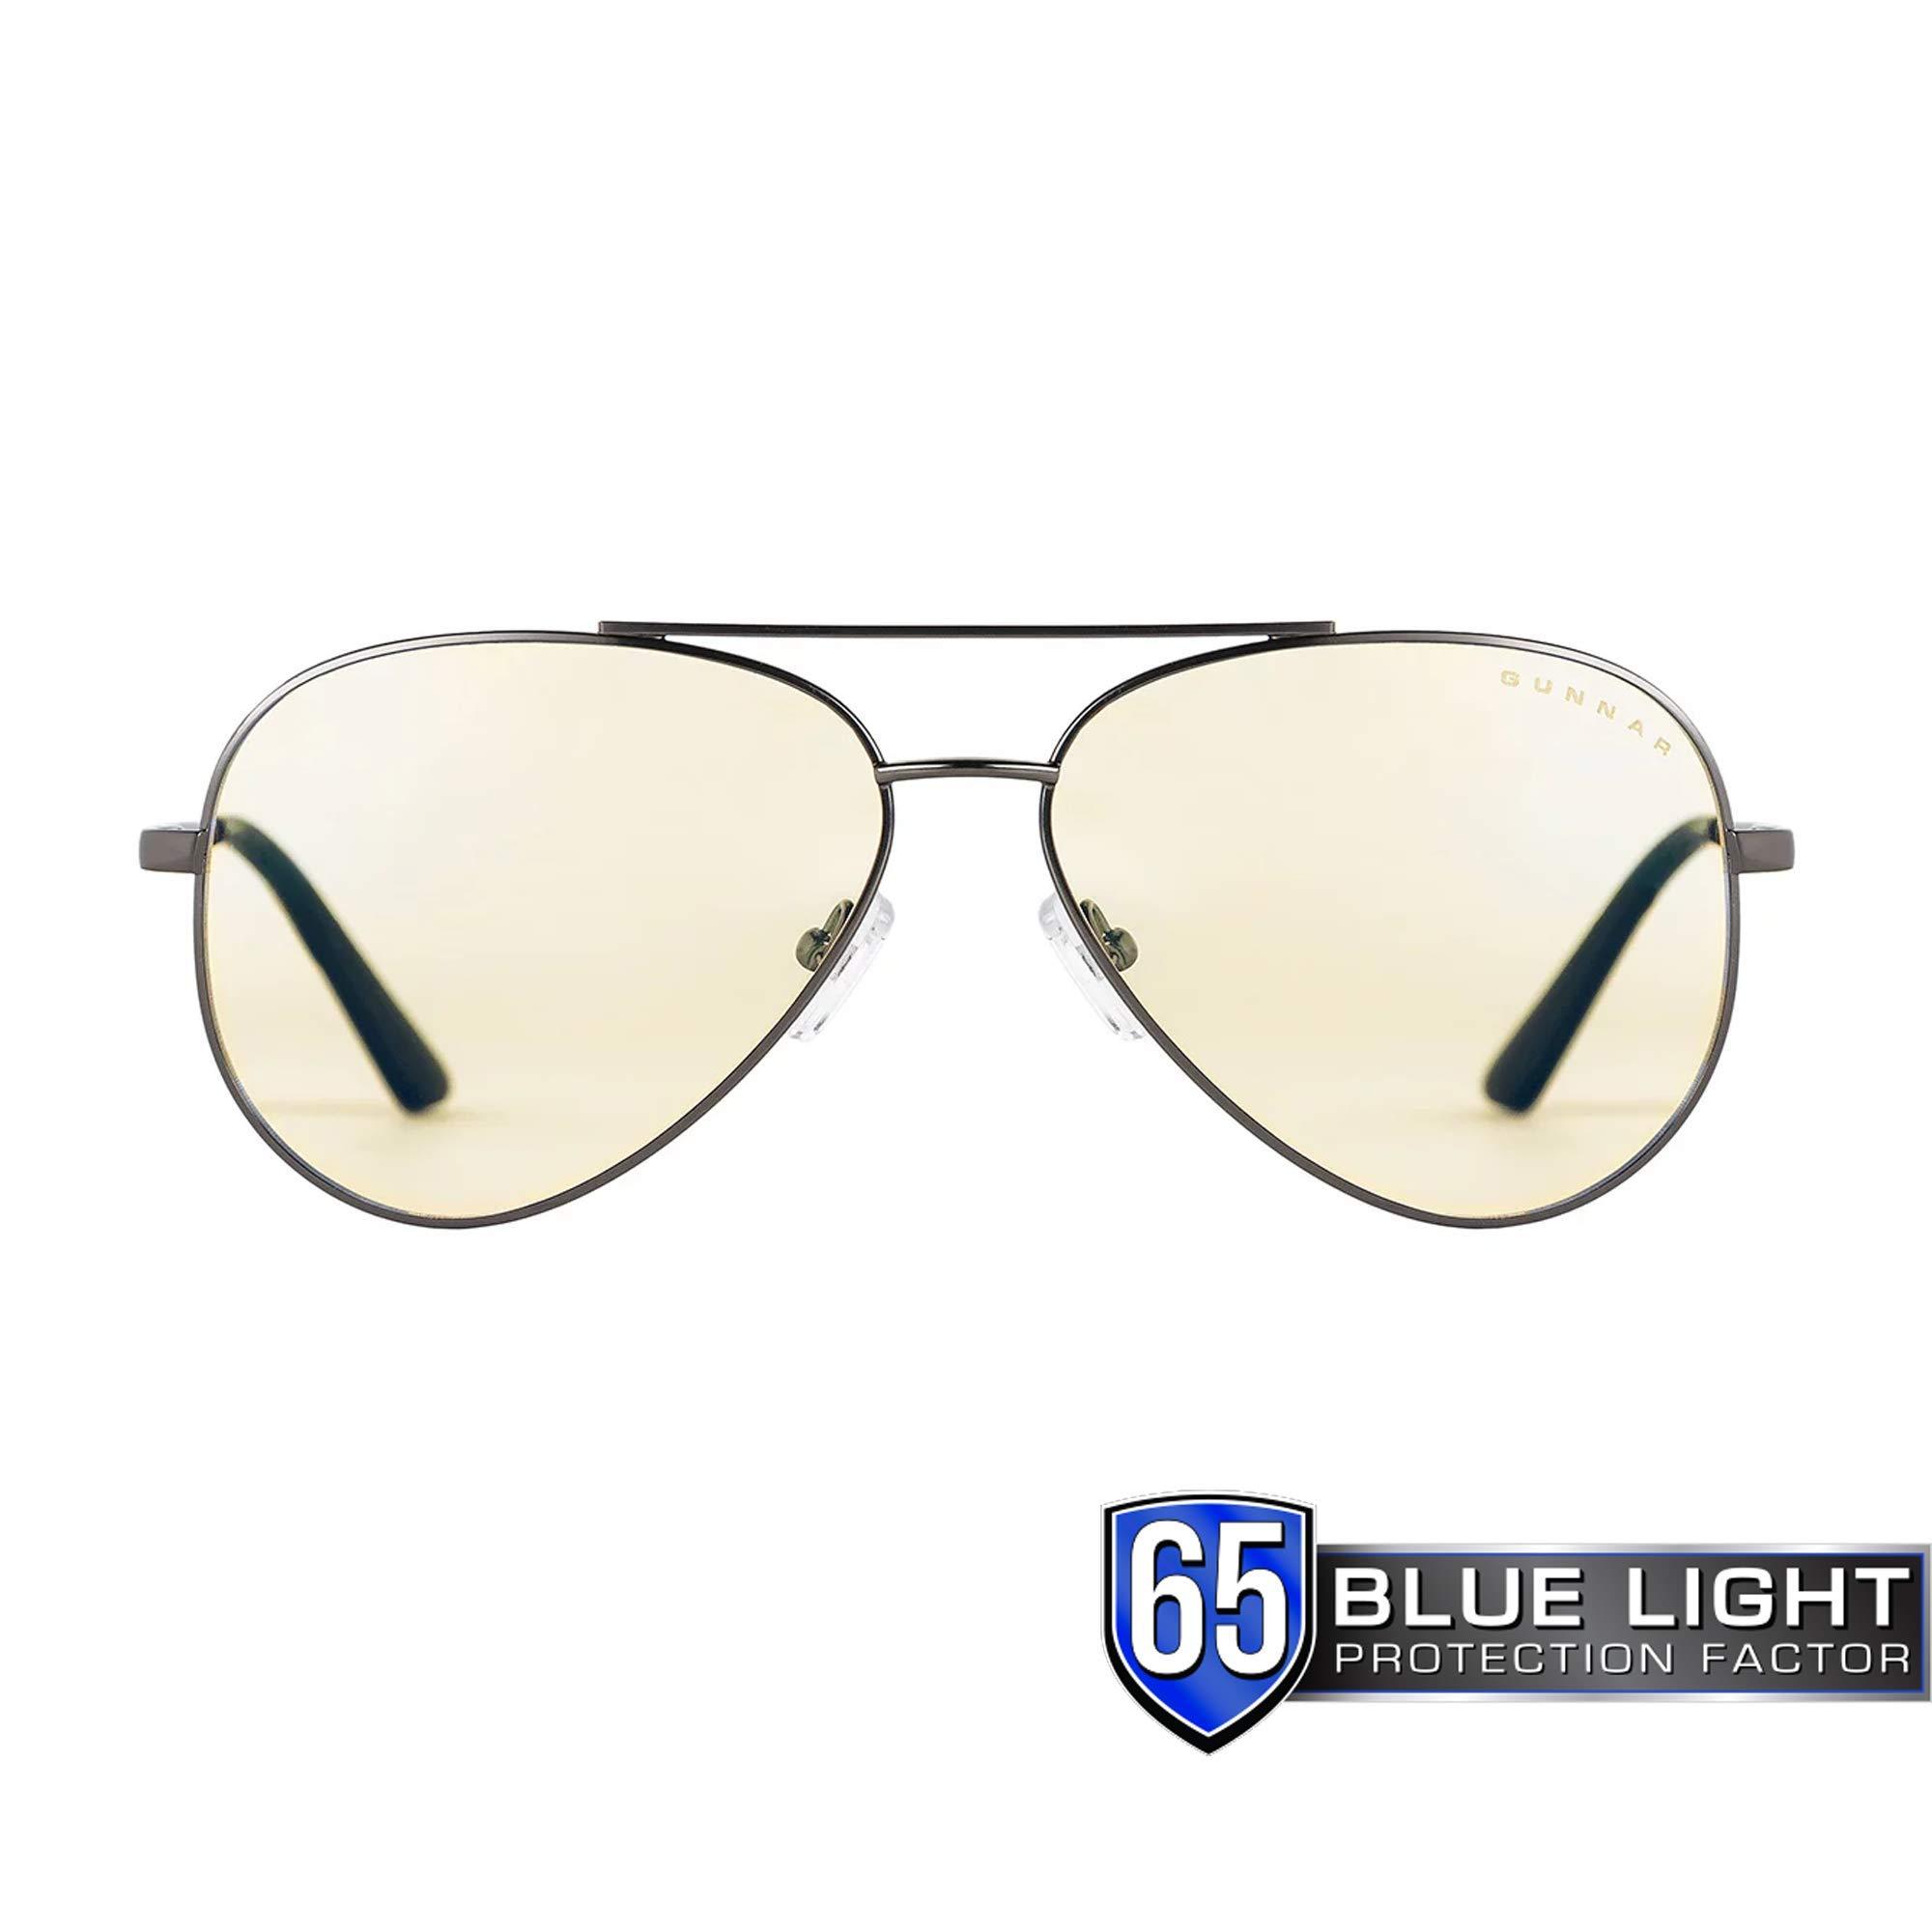 GUNNAR Gaming and Computer Eyewear/Maverick, Amber Tint - Patented Lens, Reduce Digital Eye Strain, Block 65% of Harmful Blue Light